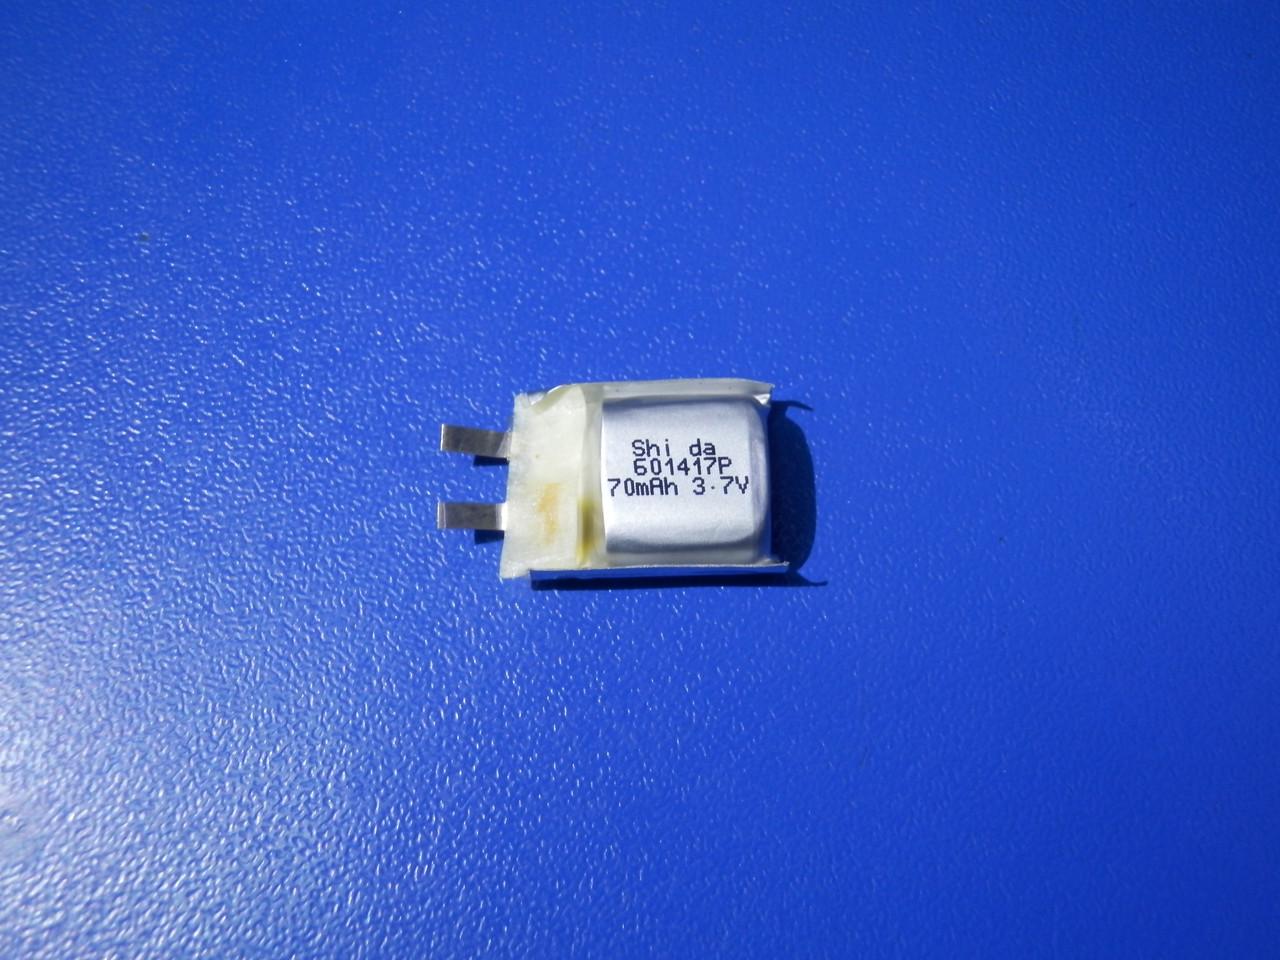 Аккумулятор Li-pol Shida 601417P 3,7v 70mAh 12C